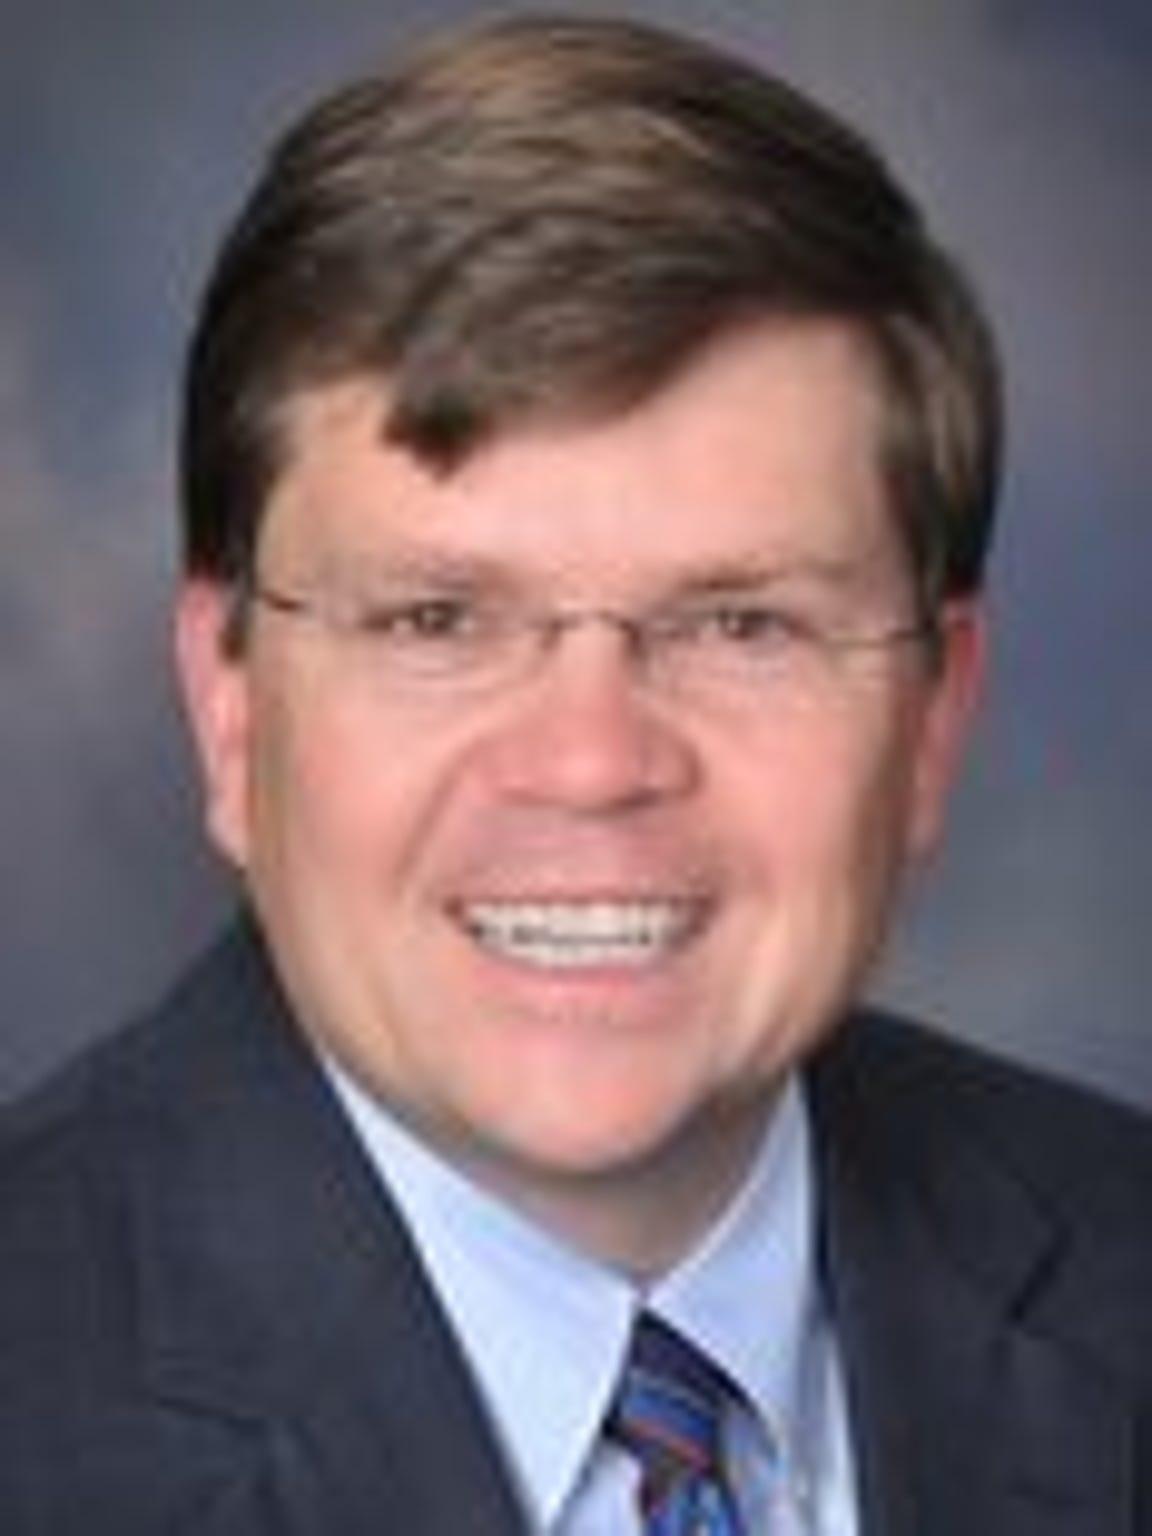 Dr. Bill Hathaway